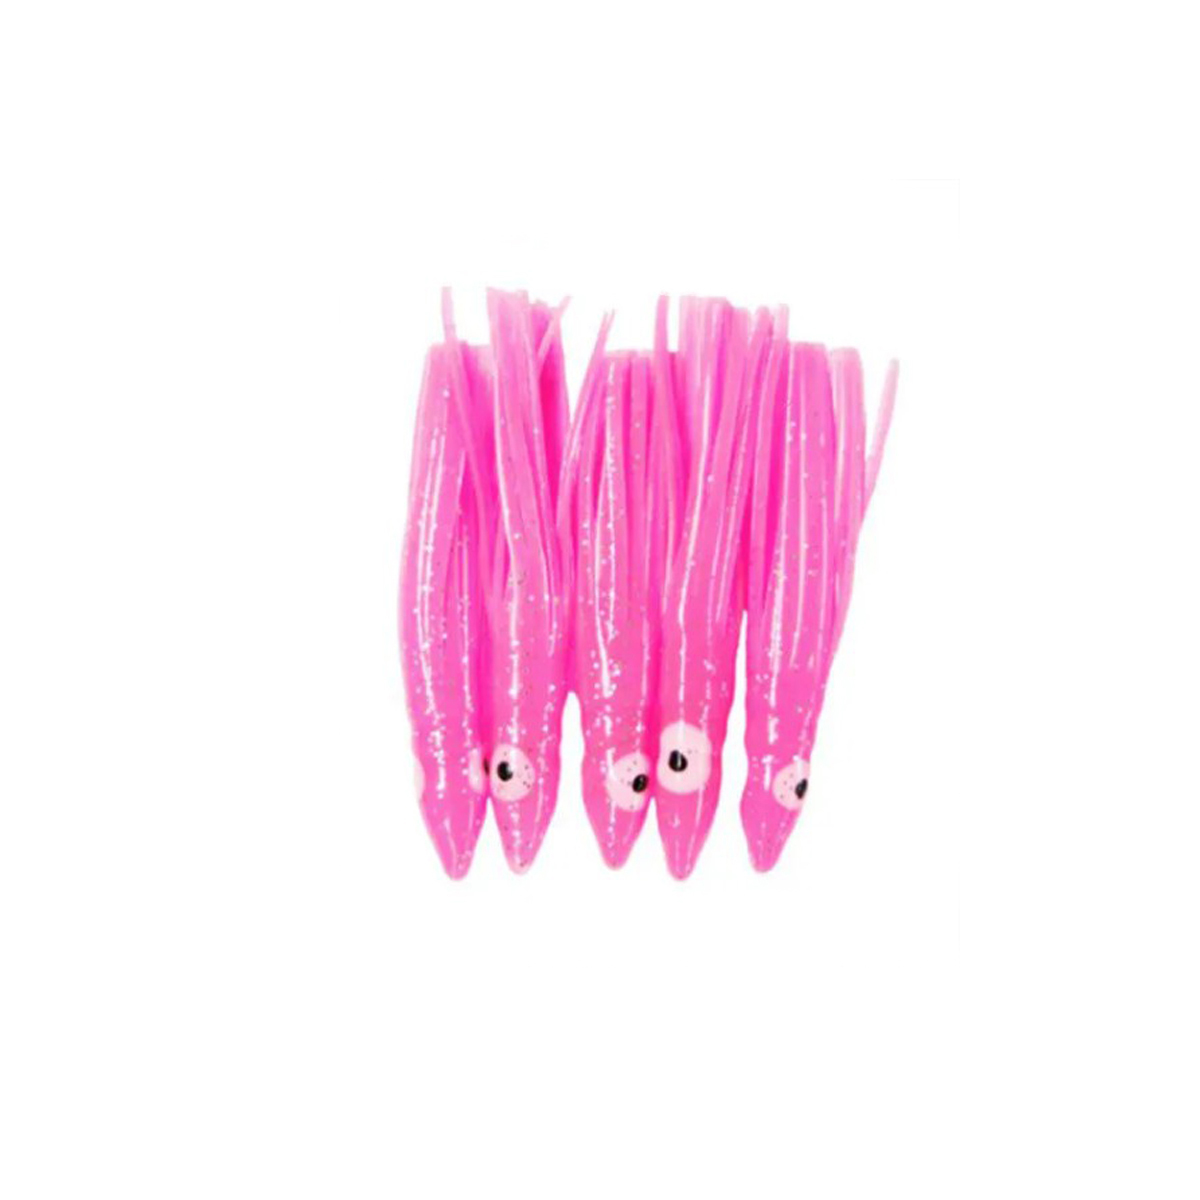 Kit 25 Lulinhas Kalmar 6,3 cm (Rosa)  - Pró Pesca Shop